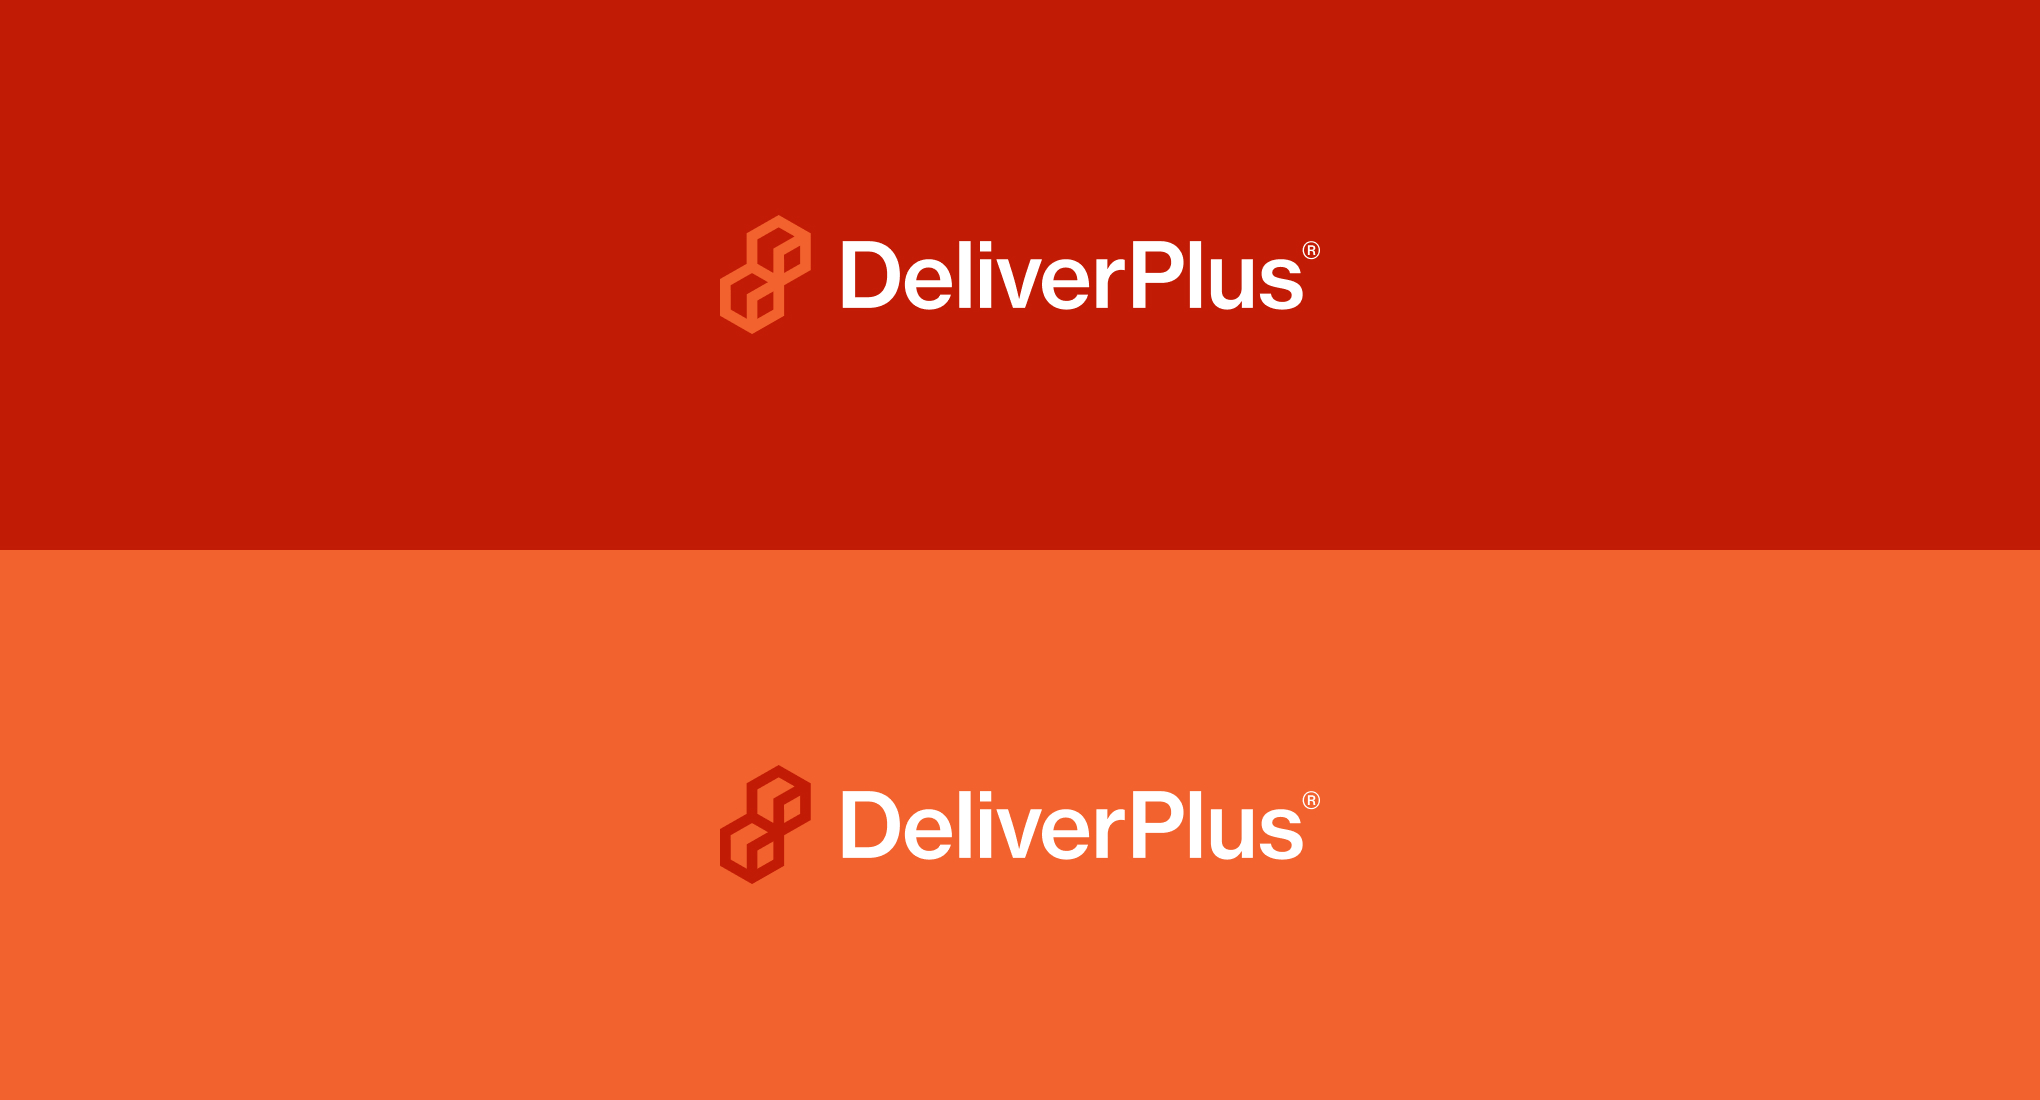 DeliverPlus_03